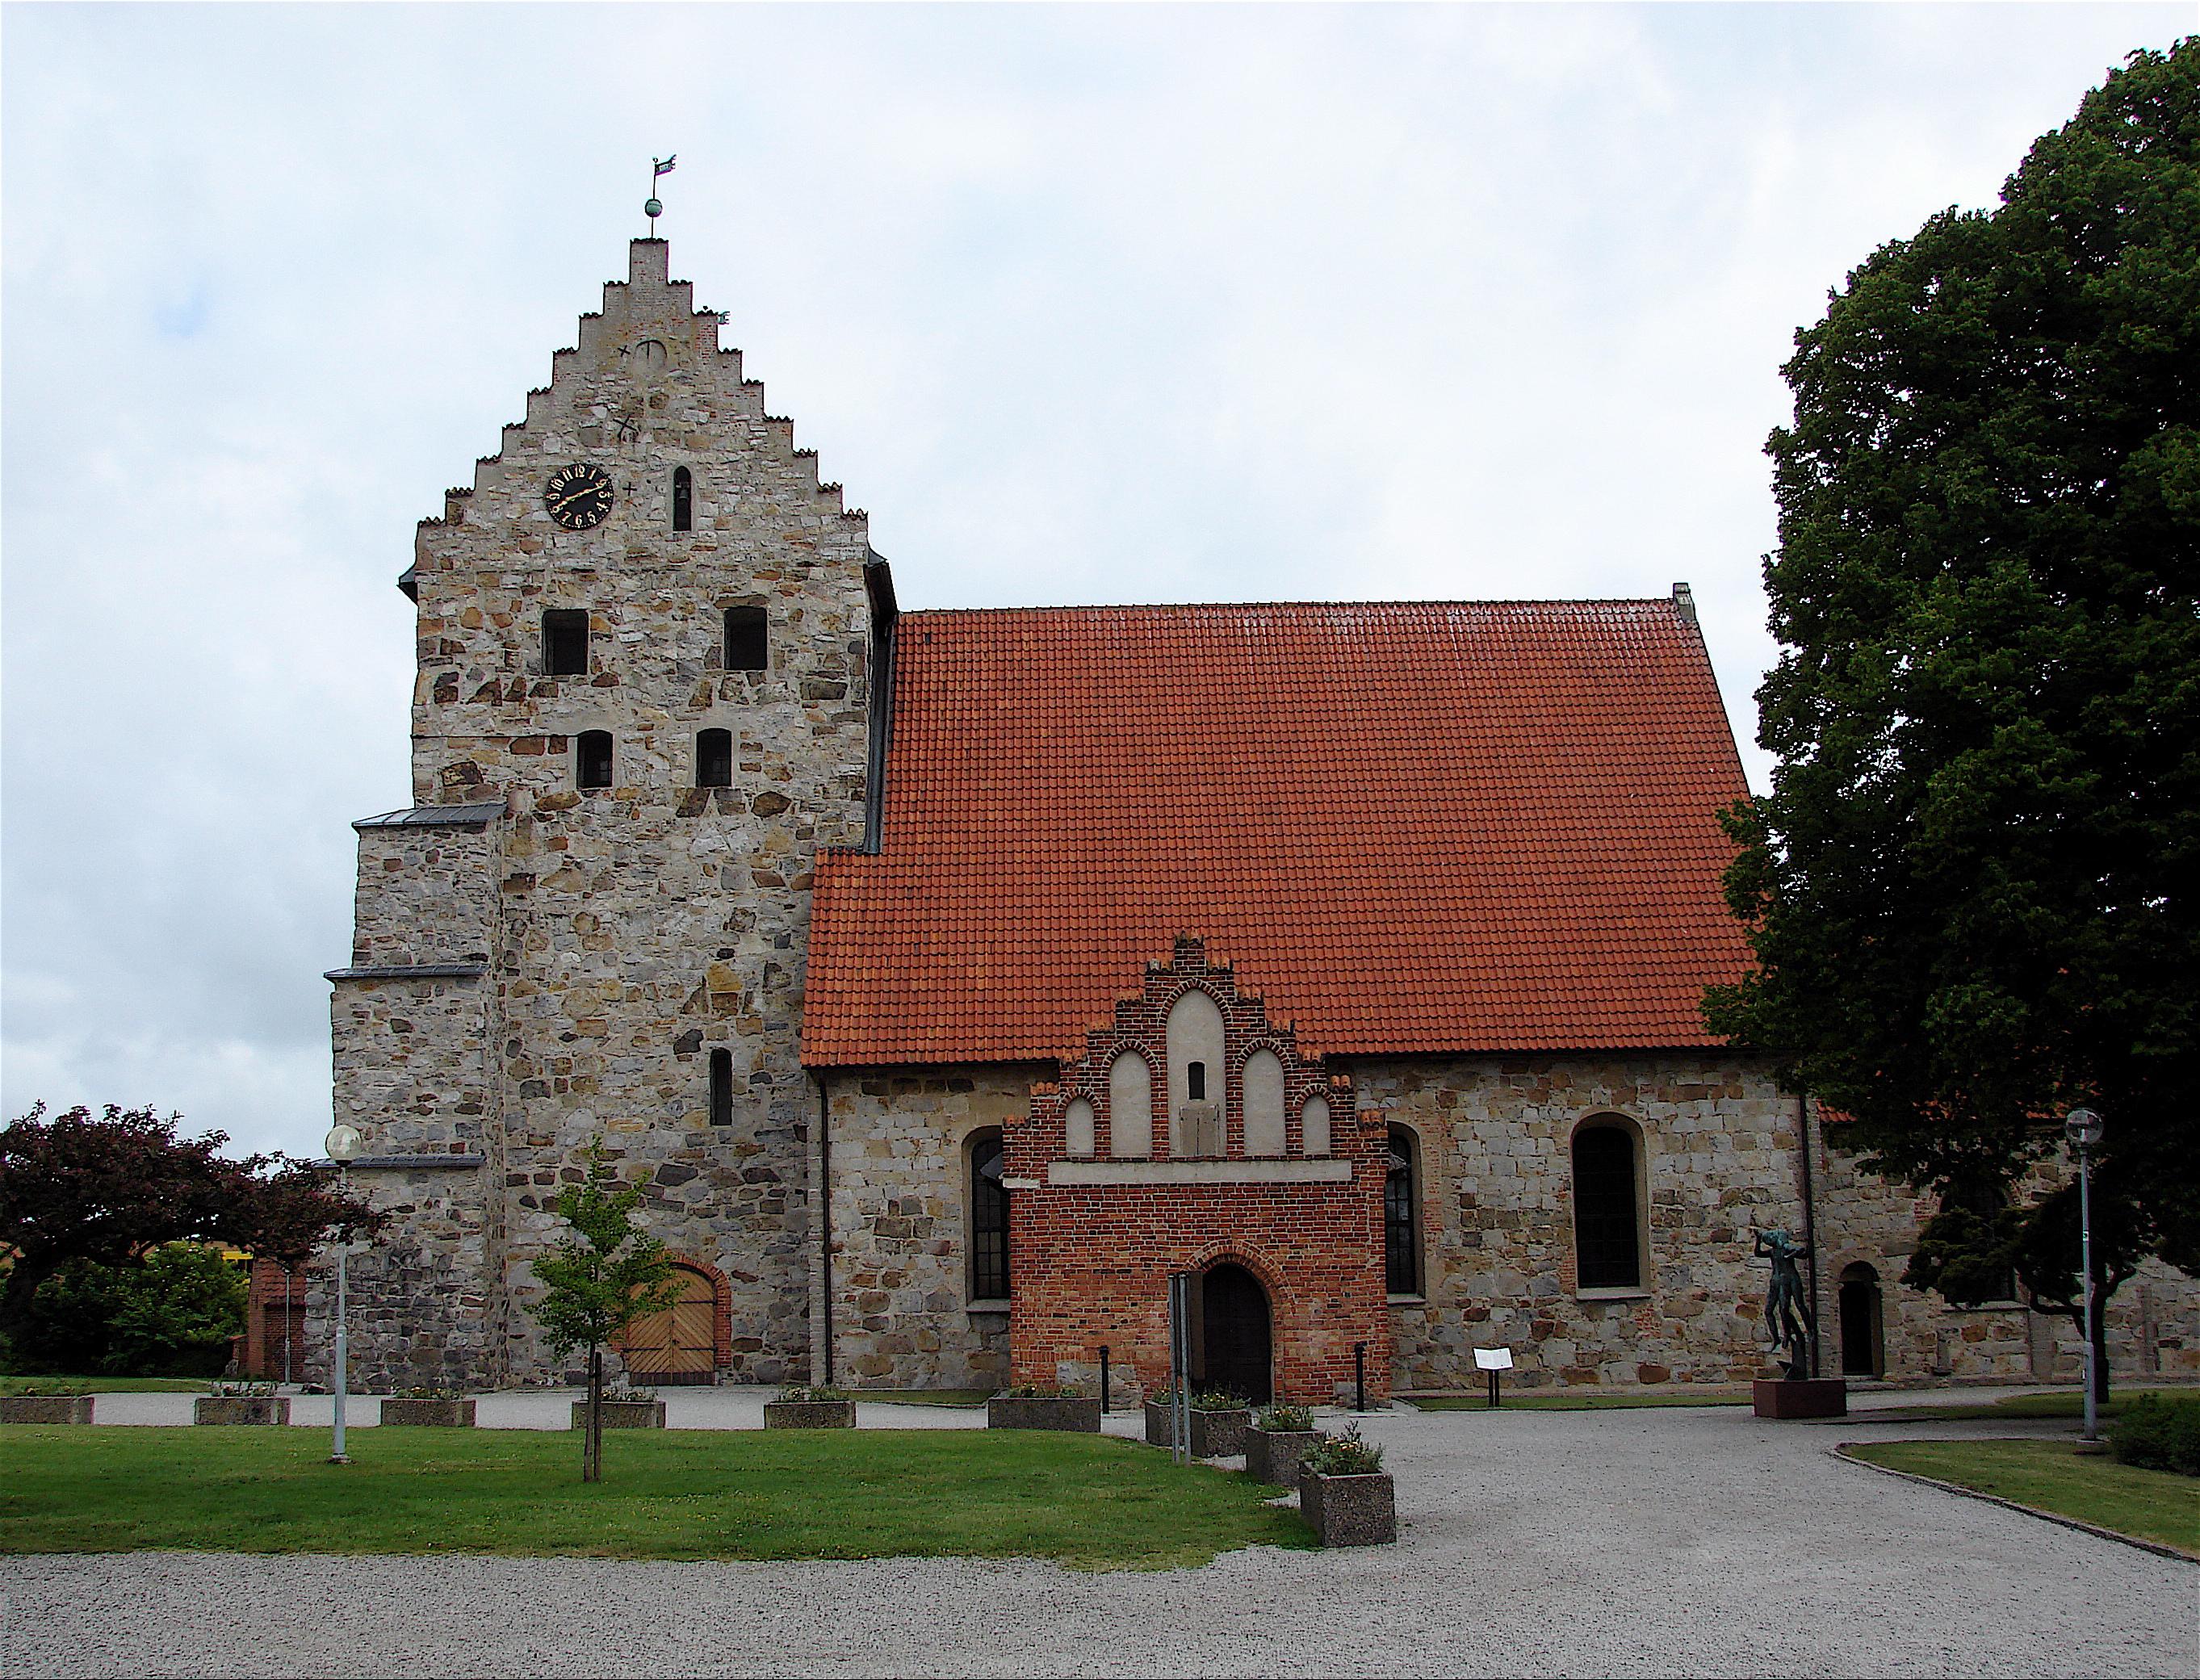 Sant Nicolai kyrka